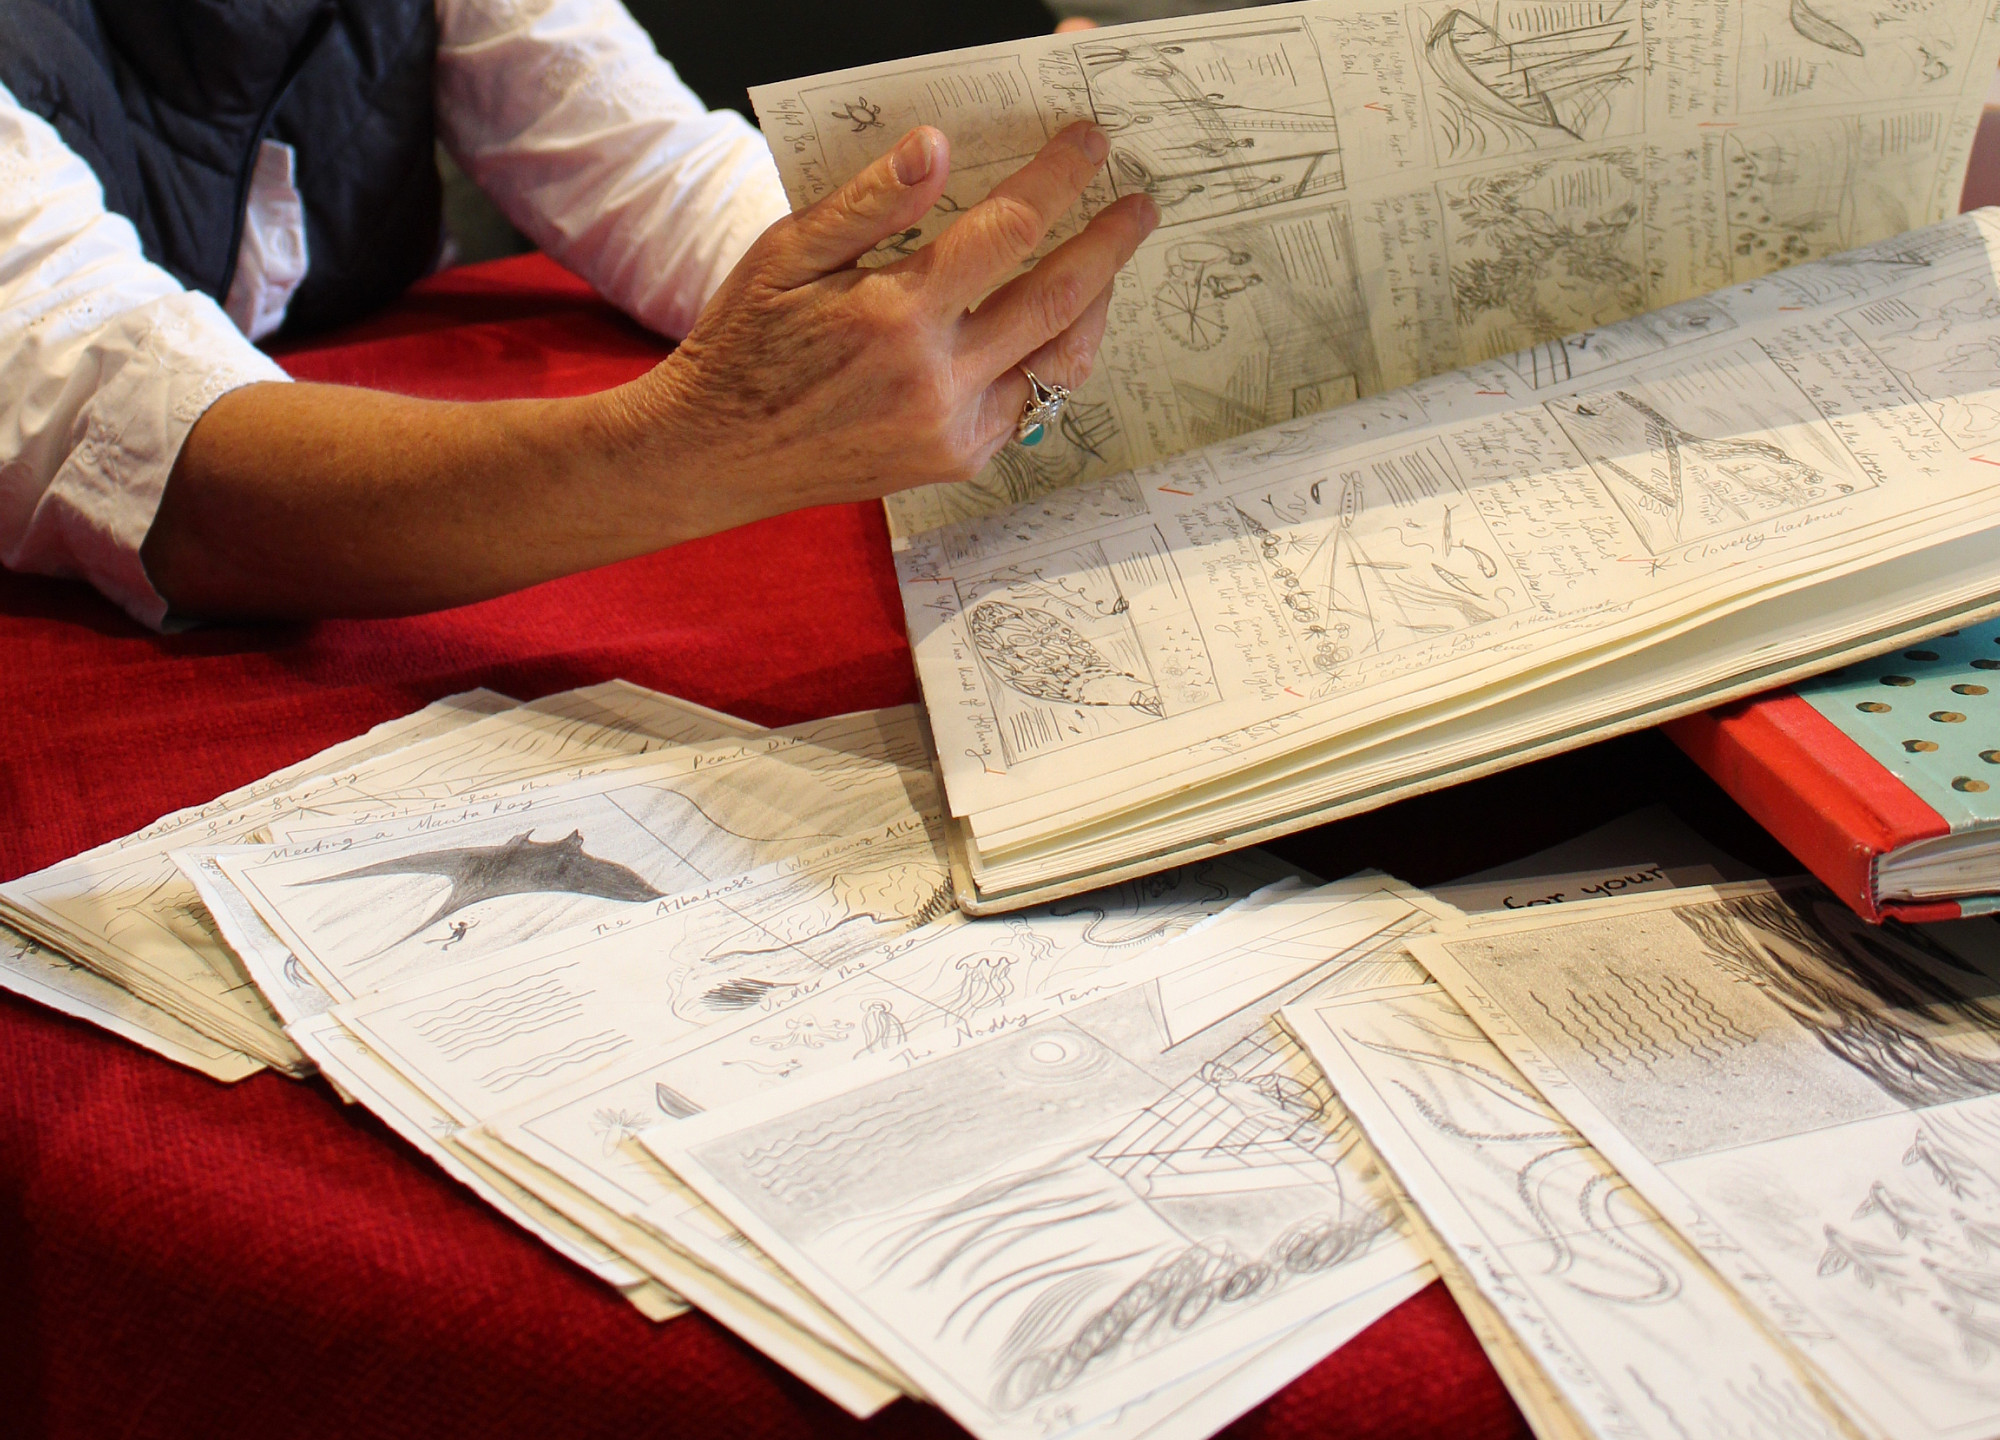 Emily's sketch books